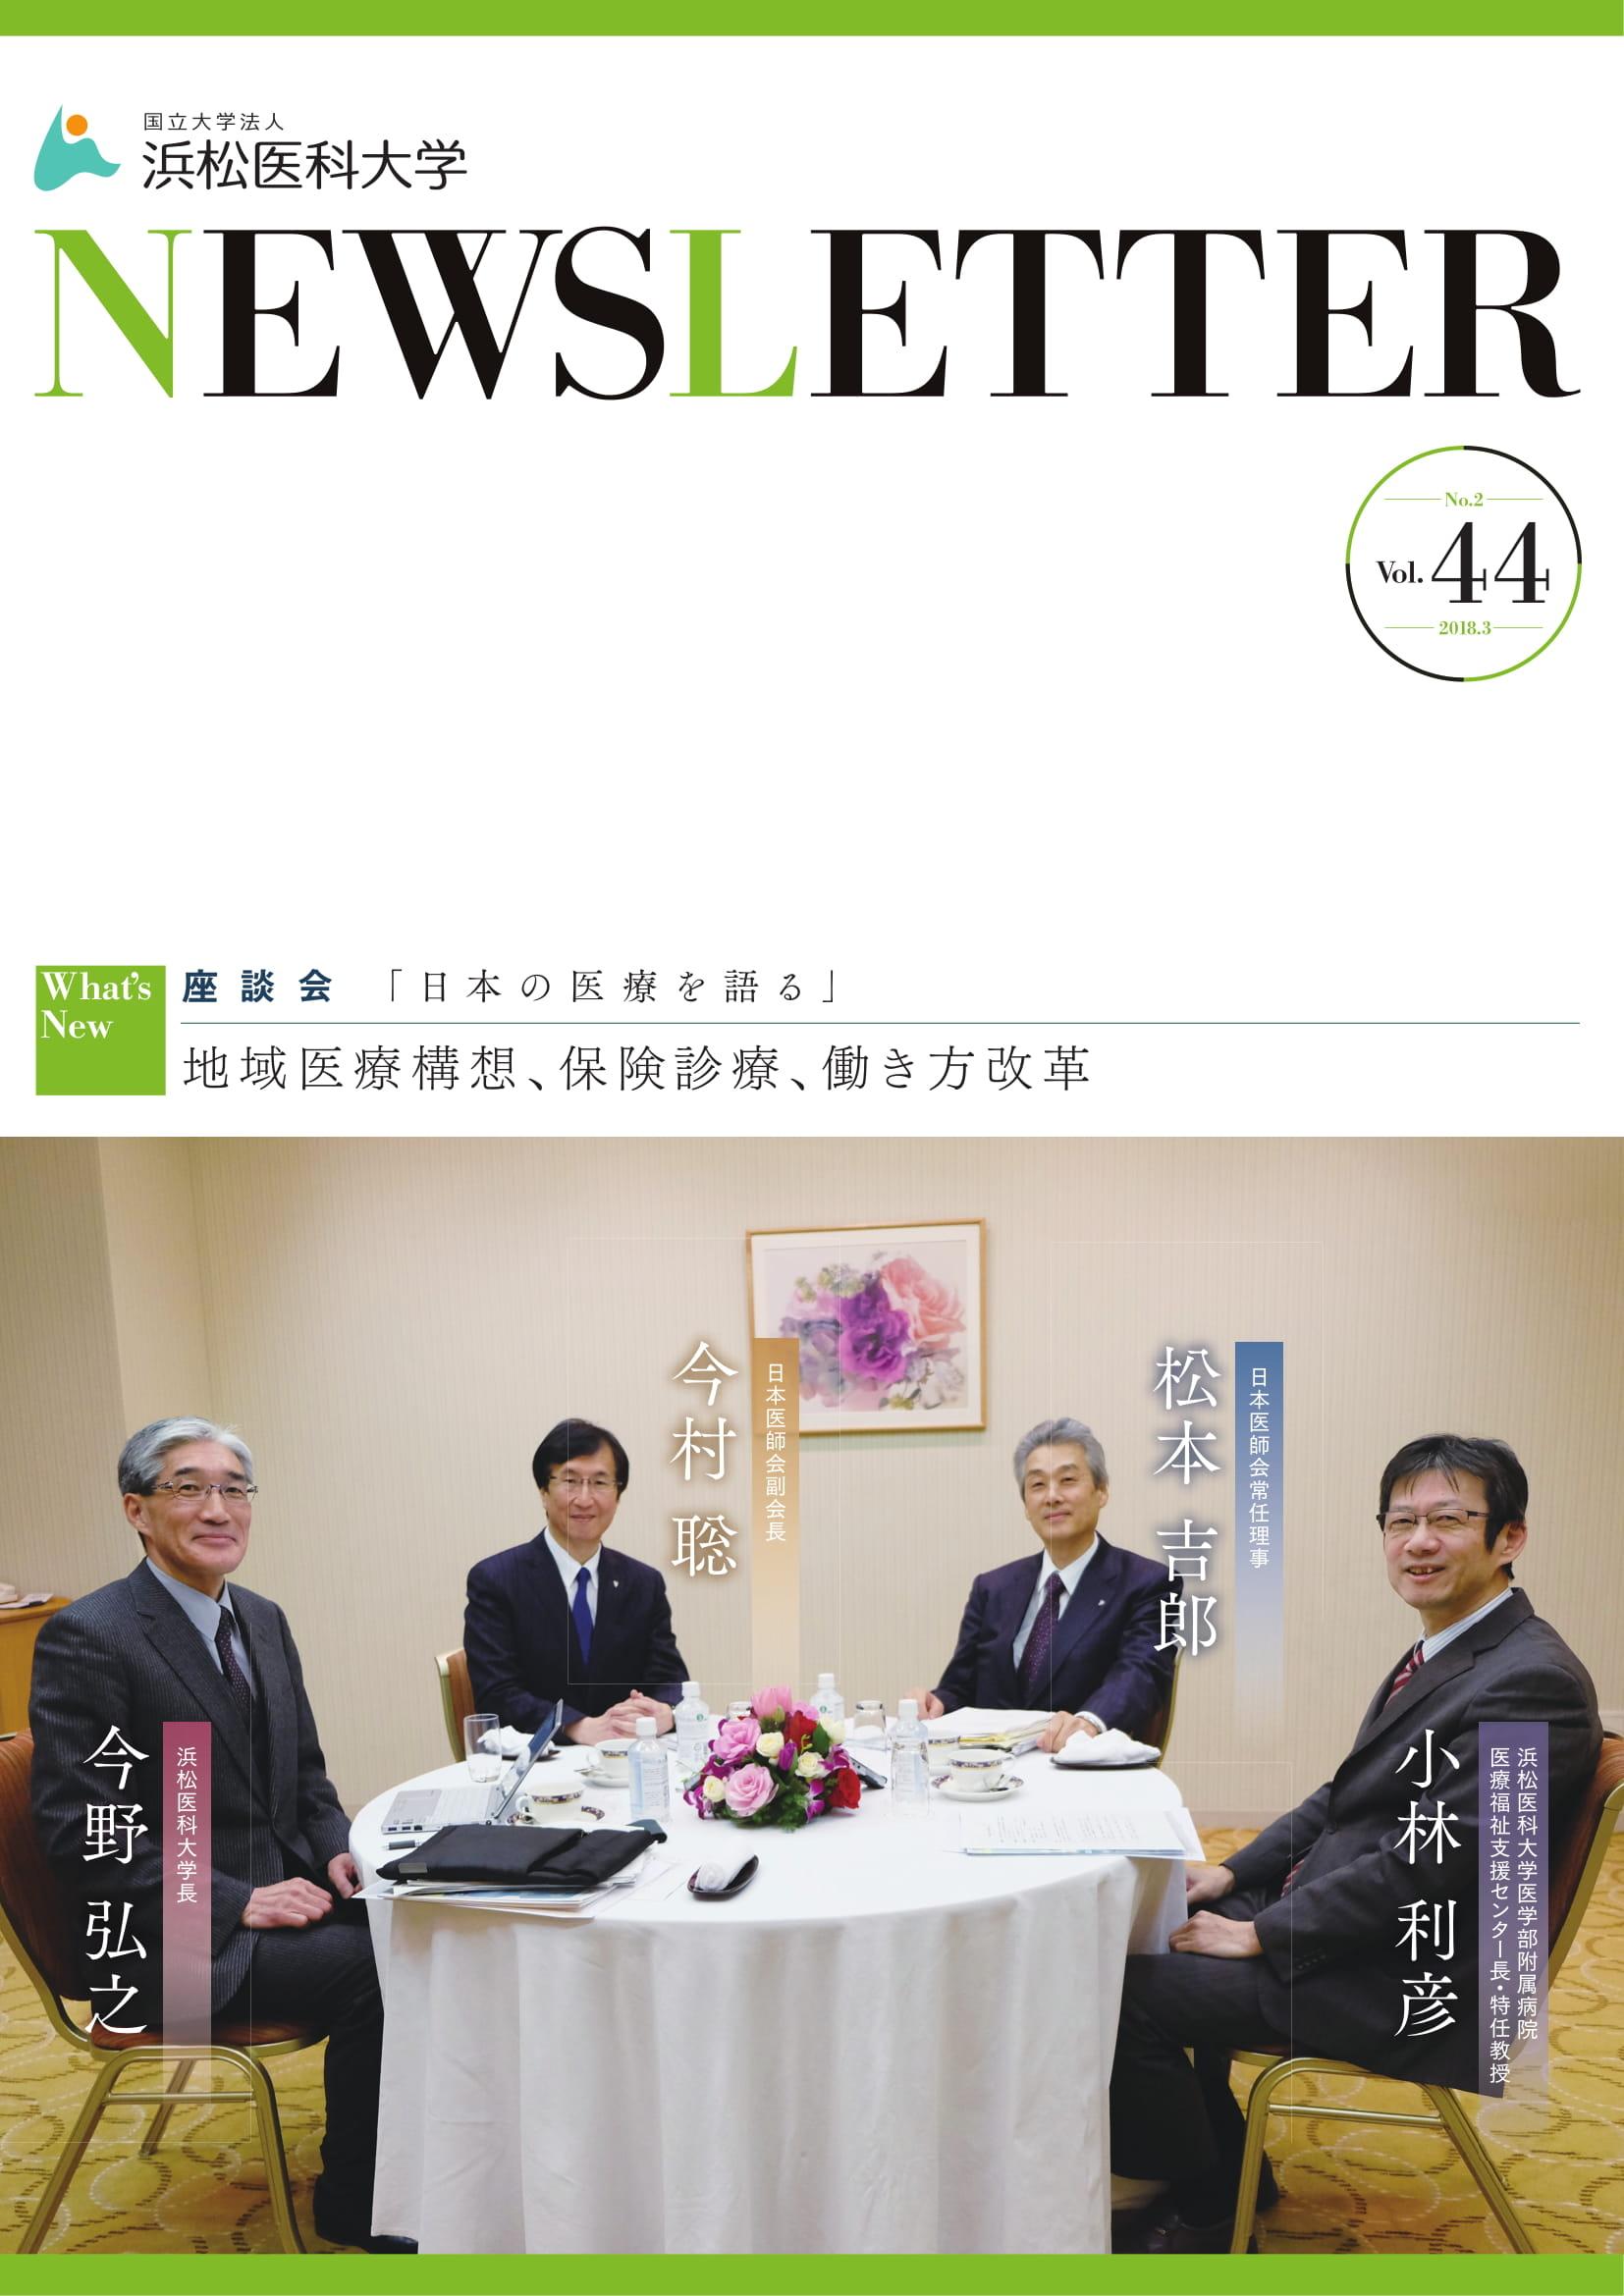 NEWSLETTER 2018.3月発行 Vol.44 No.2(PDF)